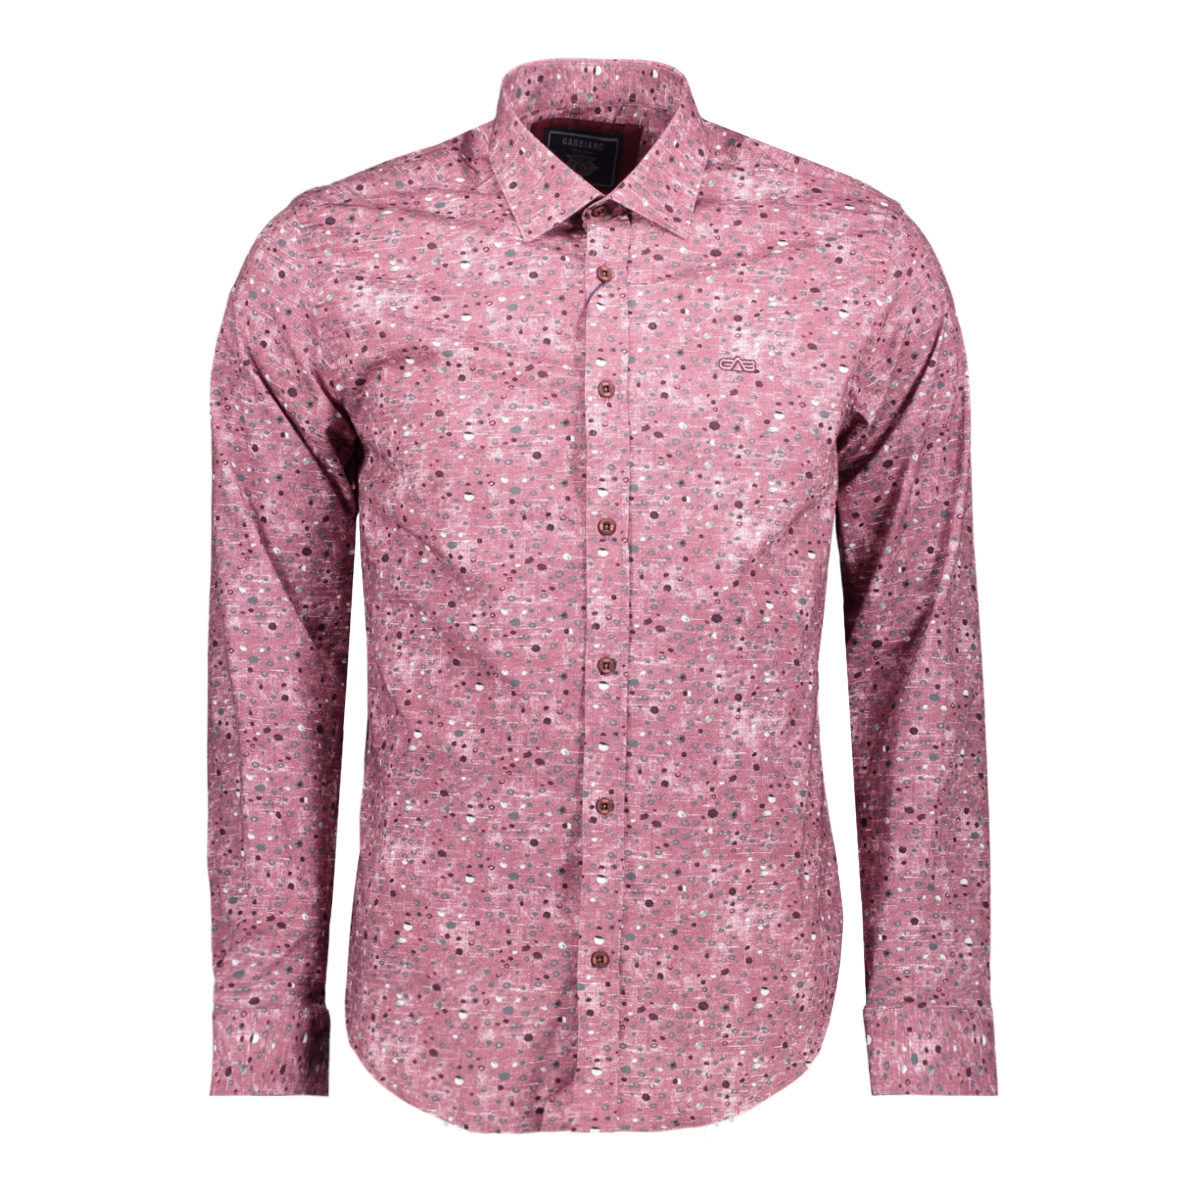 shirt 33819 gabbiano overhemd bordeaux